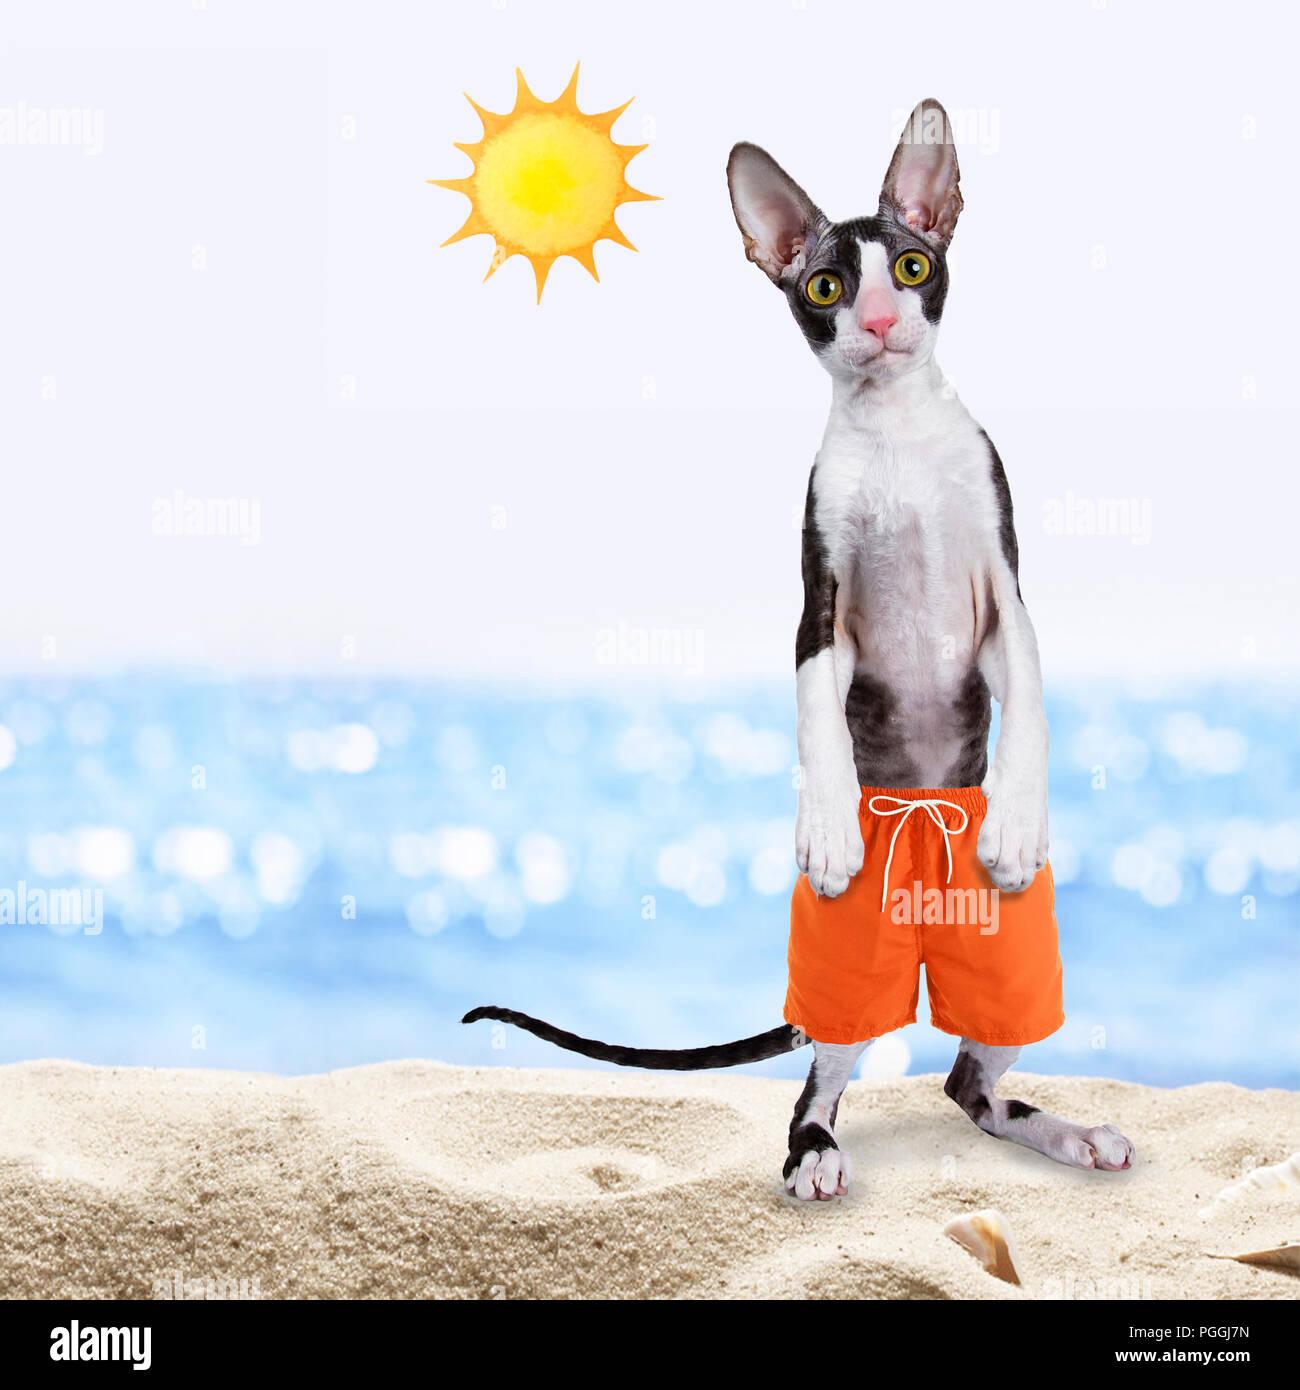 Black with white cornish rex cat standing up wearing swim shorts on beach - Stock Image